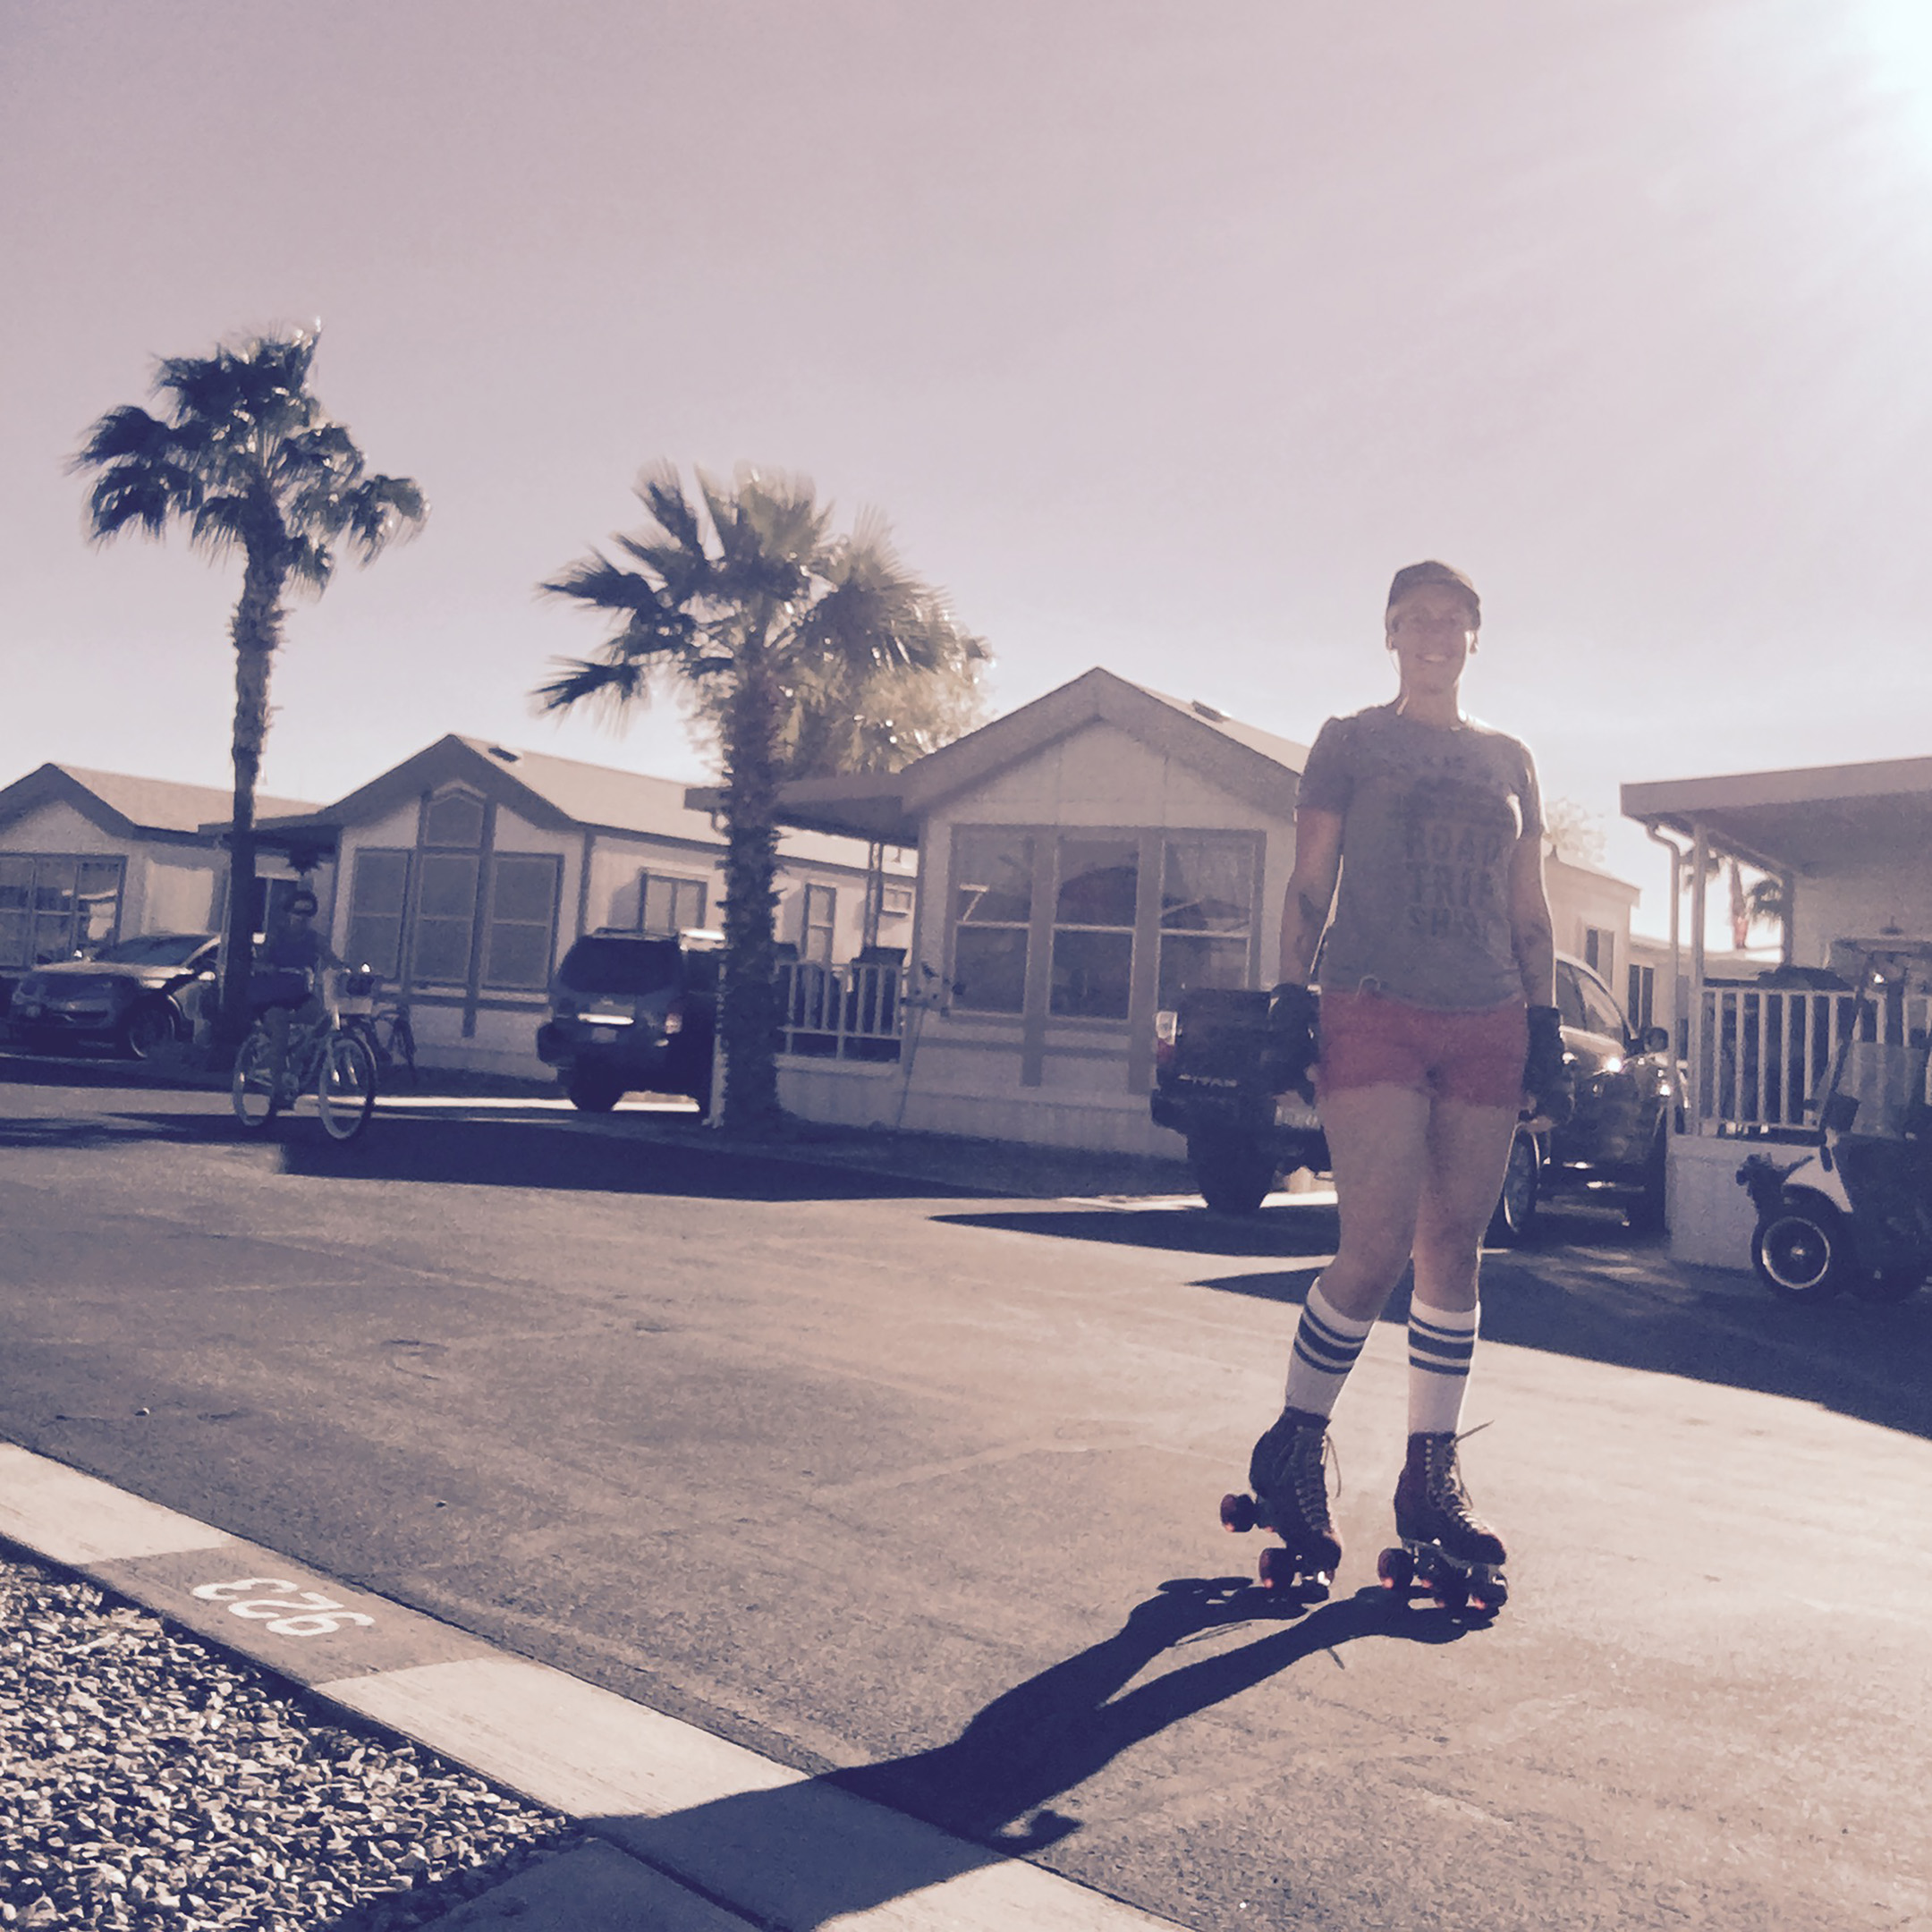 Street skating